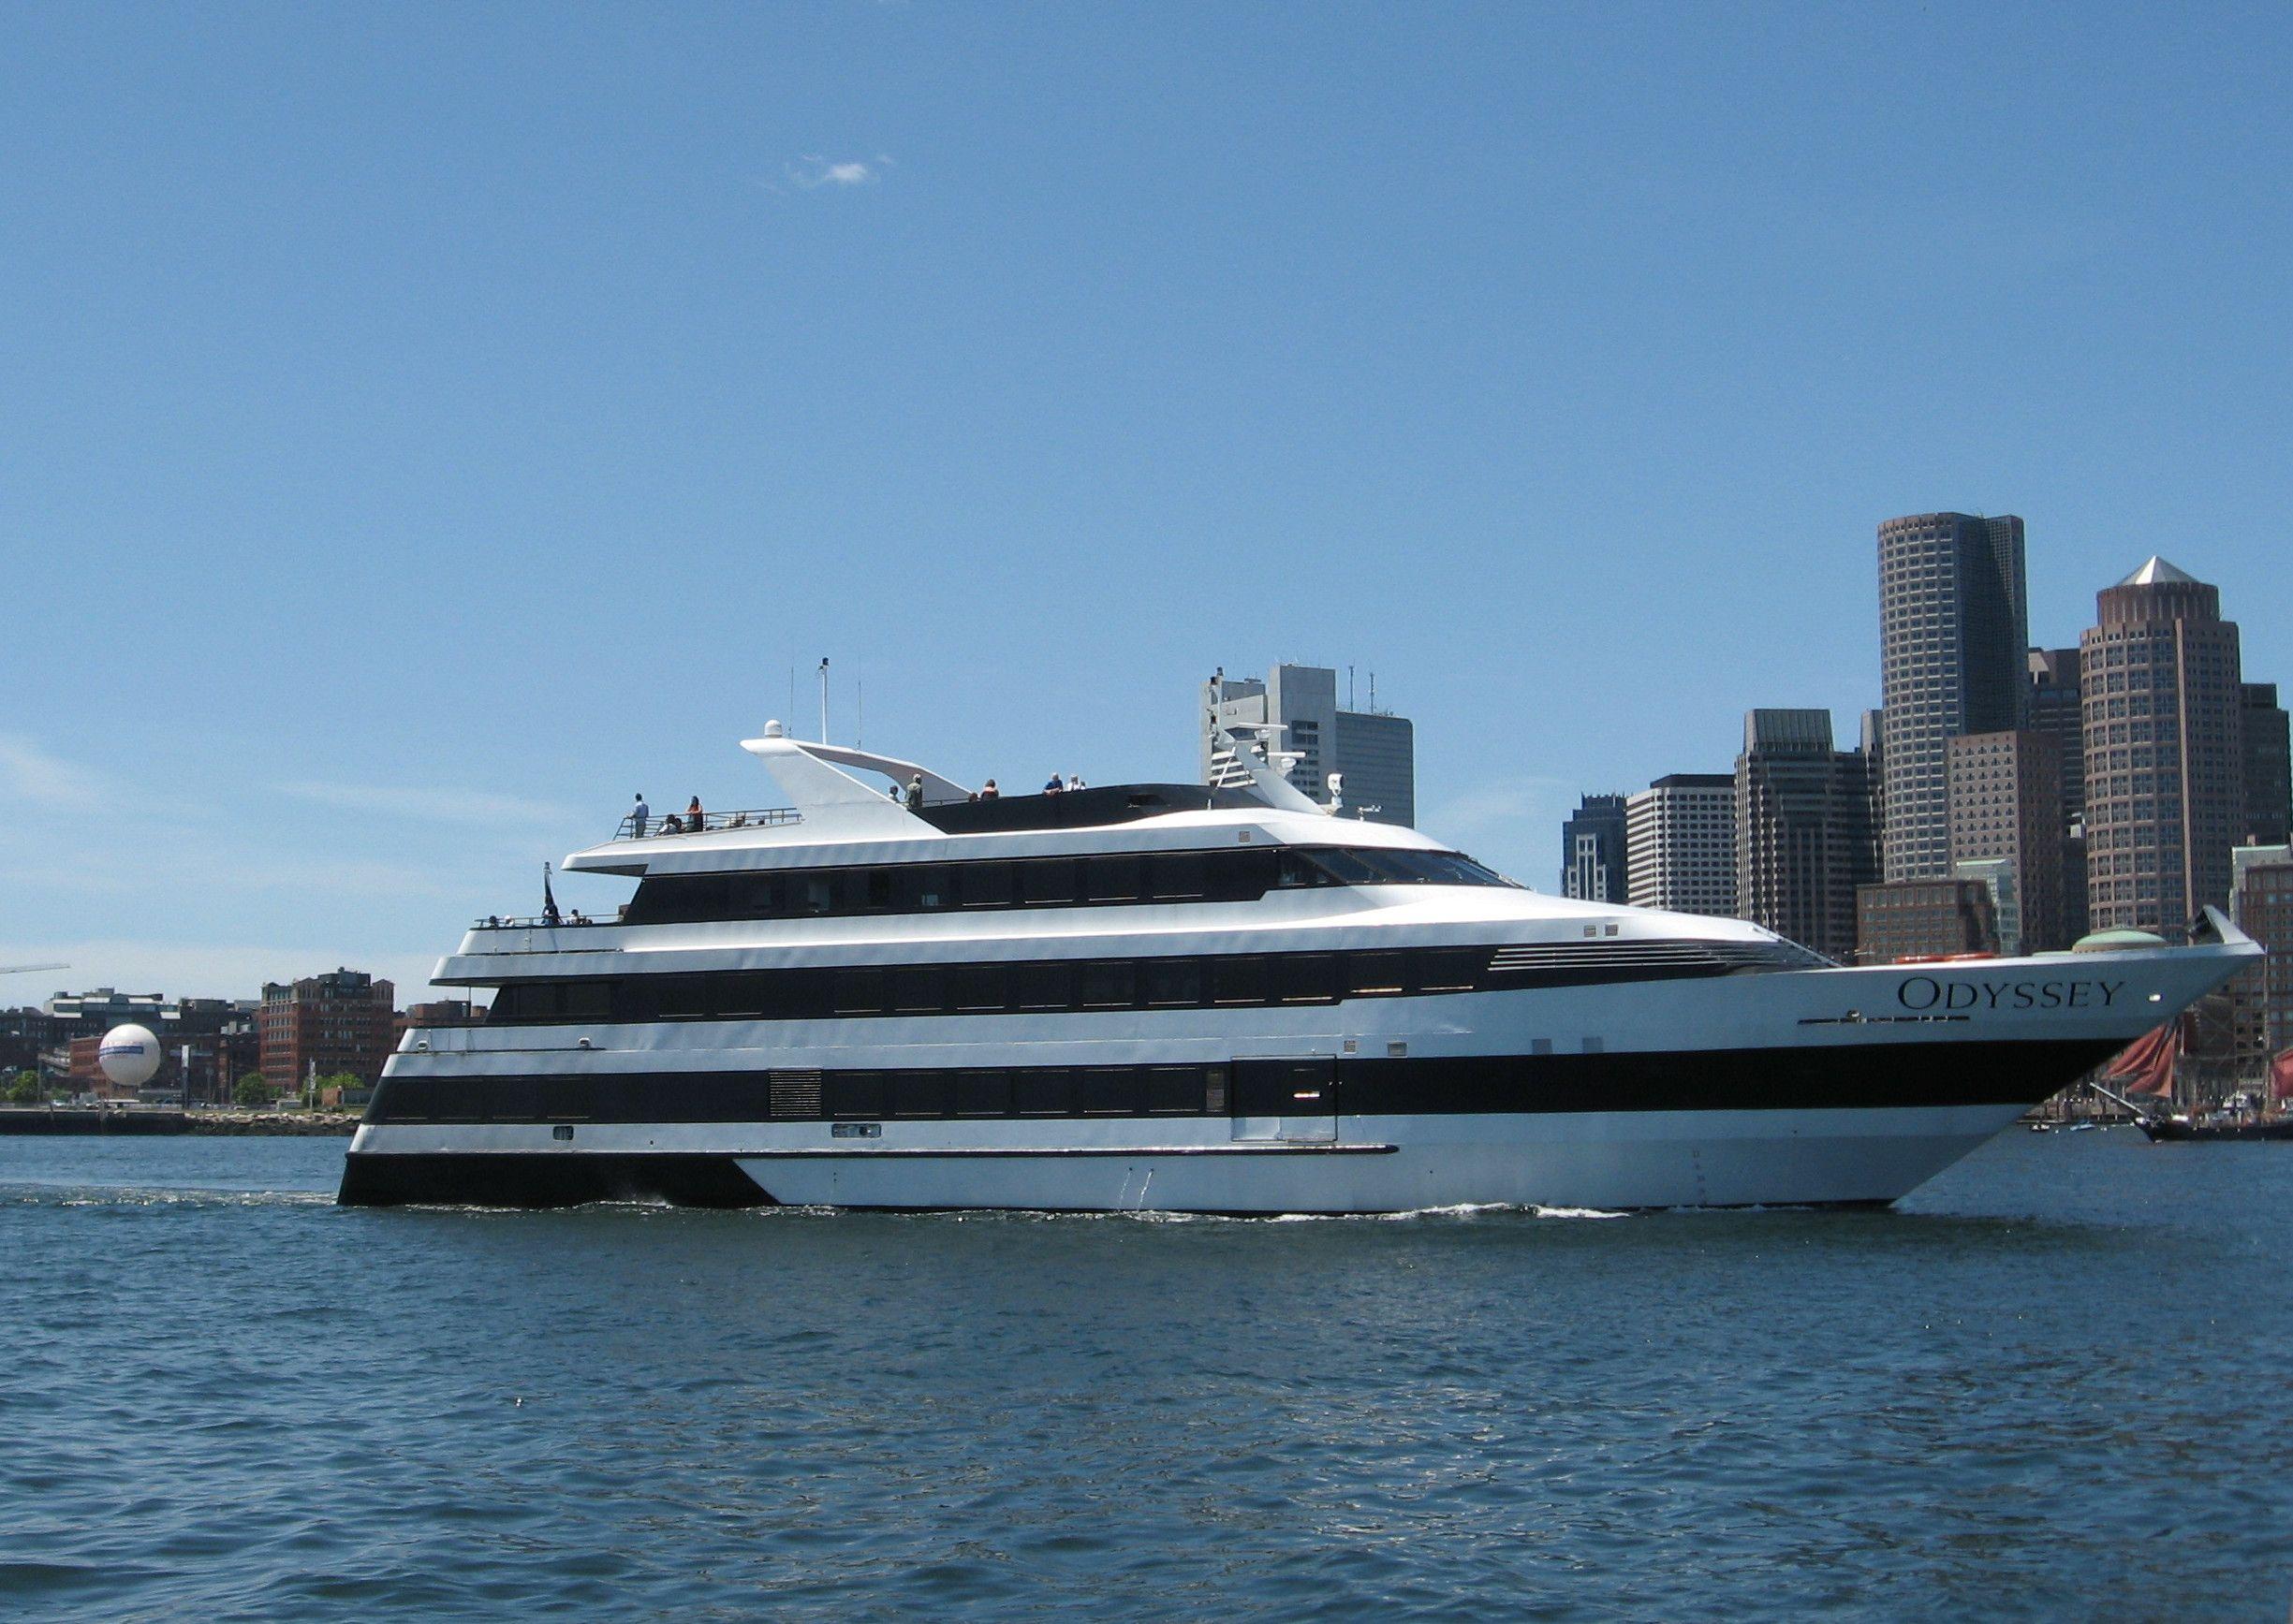 Odyssey Cruise Ship Boston Harbor LateNight Ruminations - Cruise ships out of boston